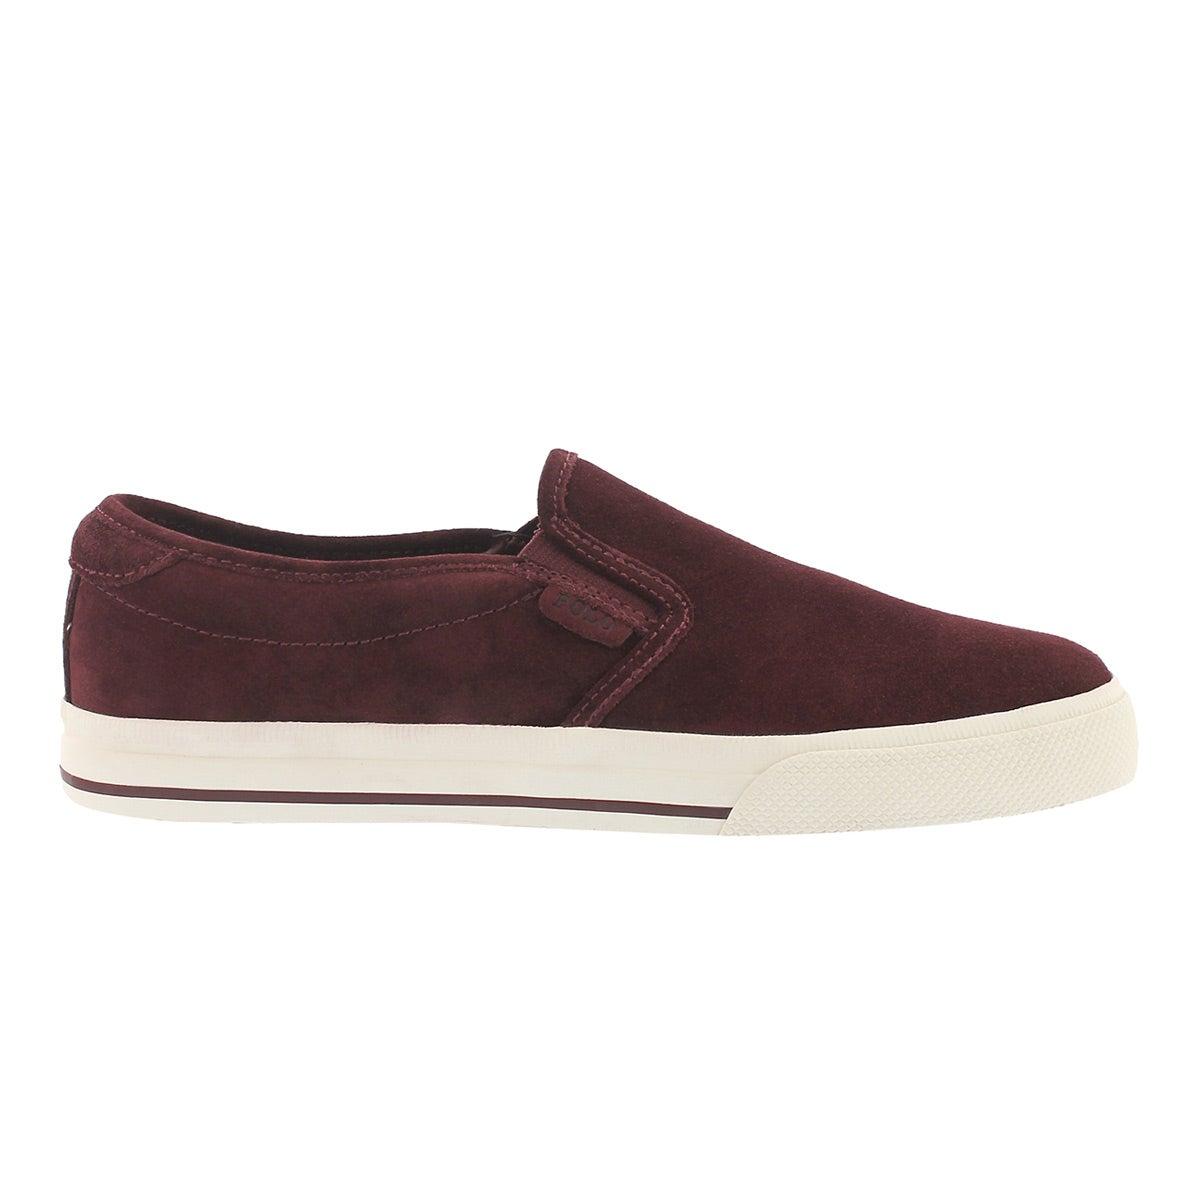 Mns Vaughn Slip On II port casual shoe